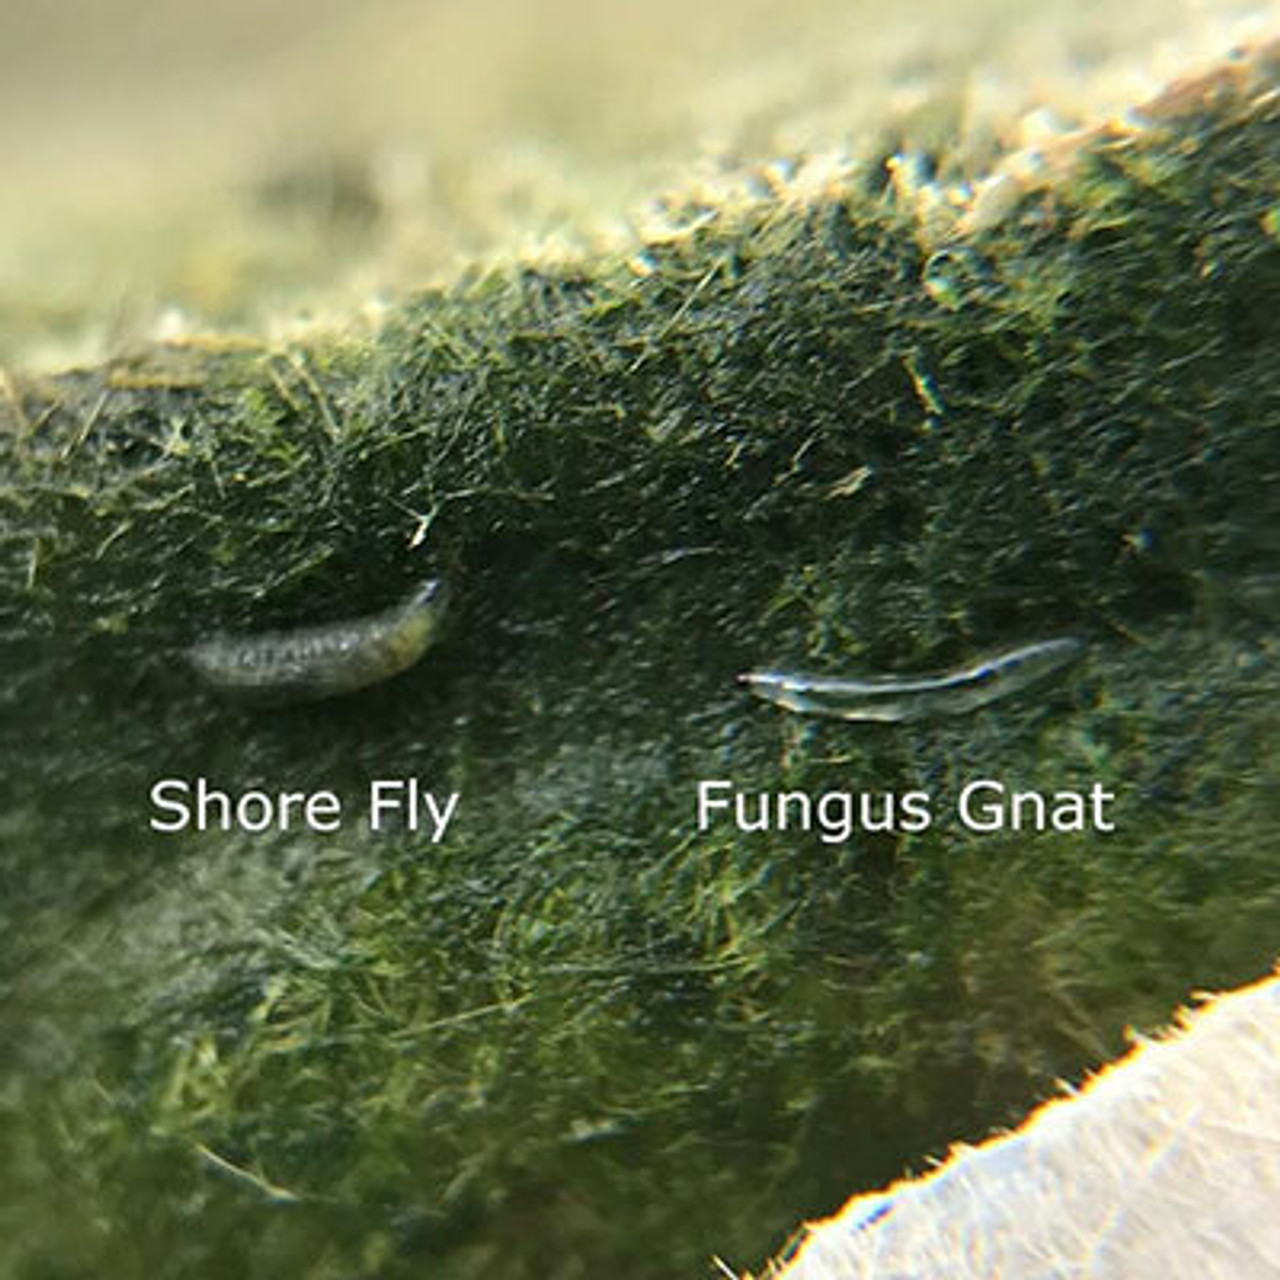 Fungus Gnats